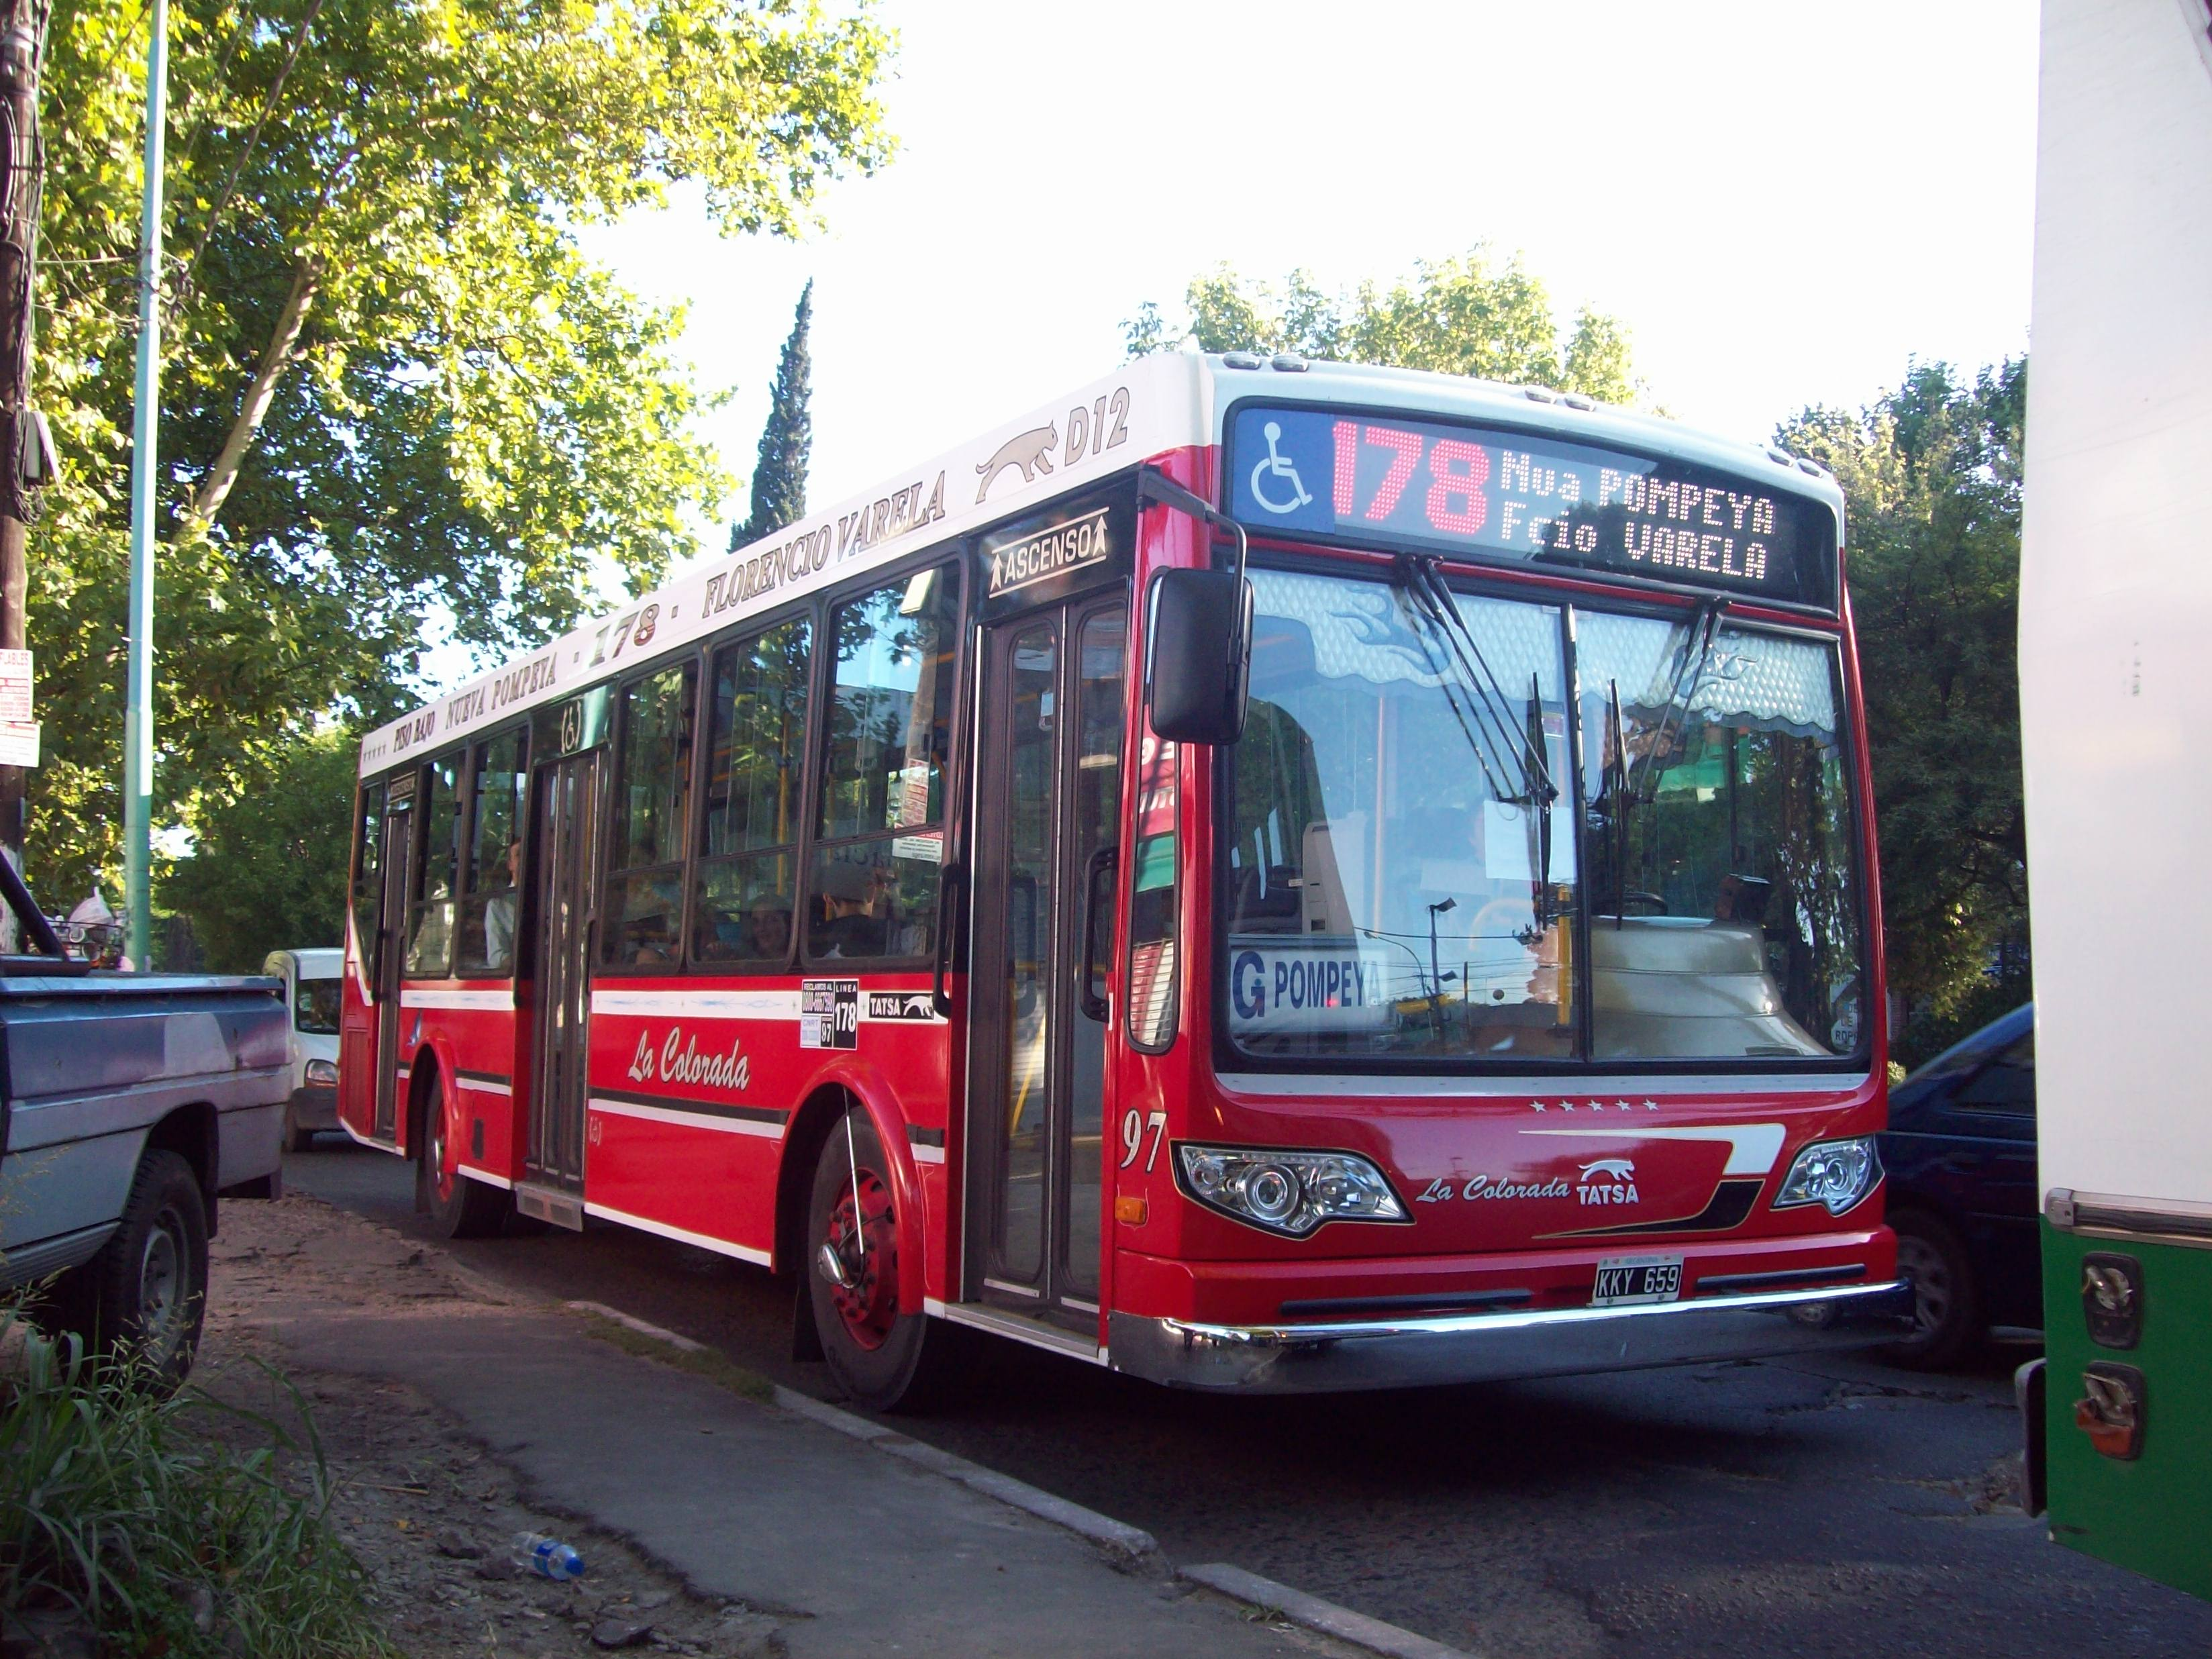 File:Línea 178 en Florencio Varela V.JPG